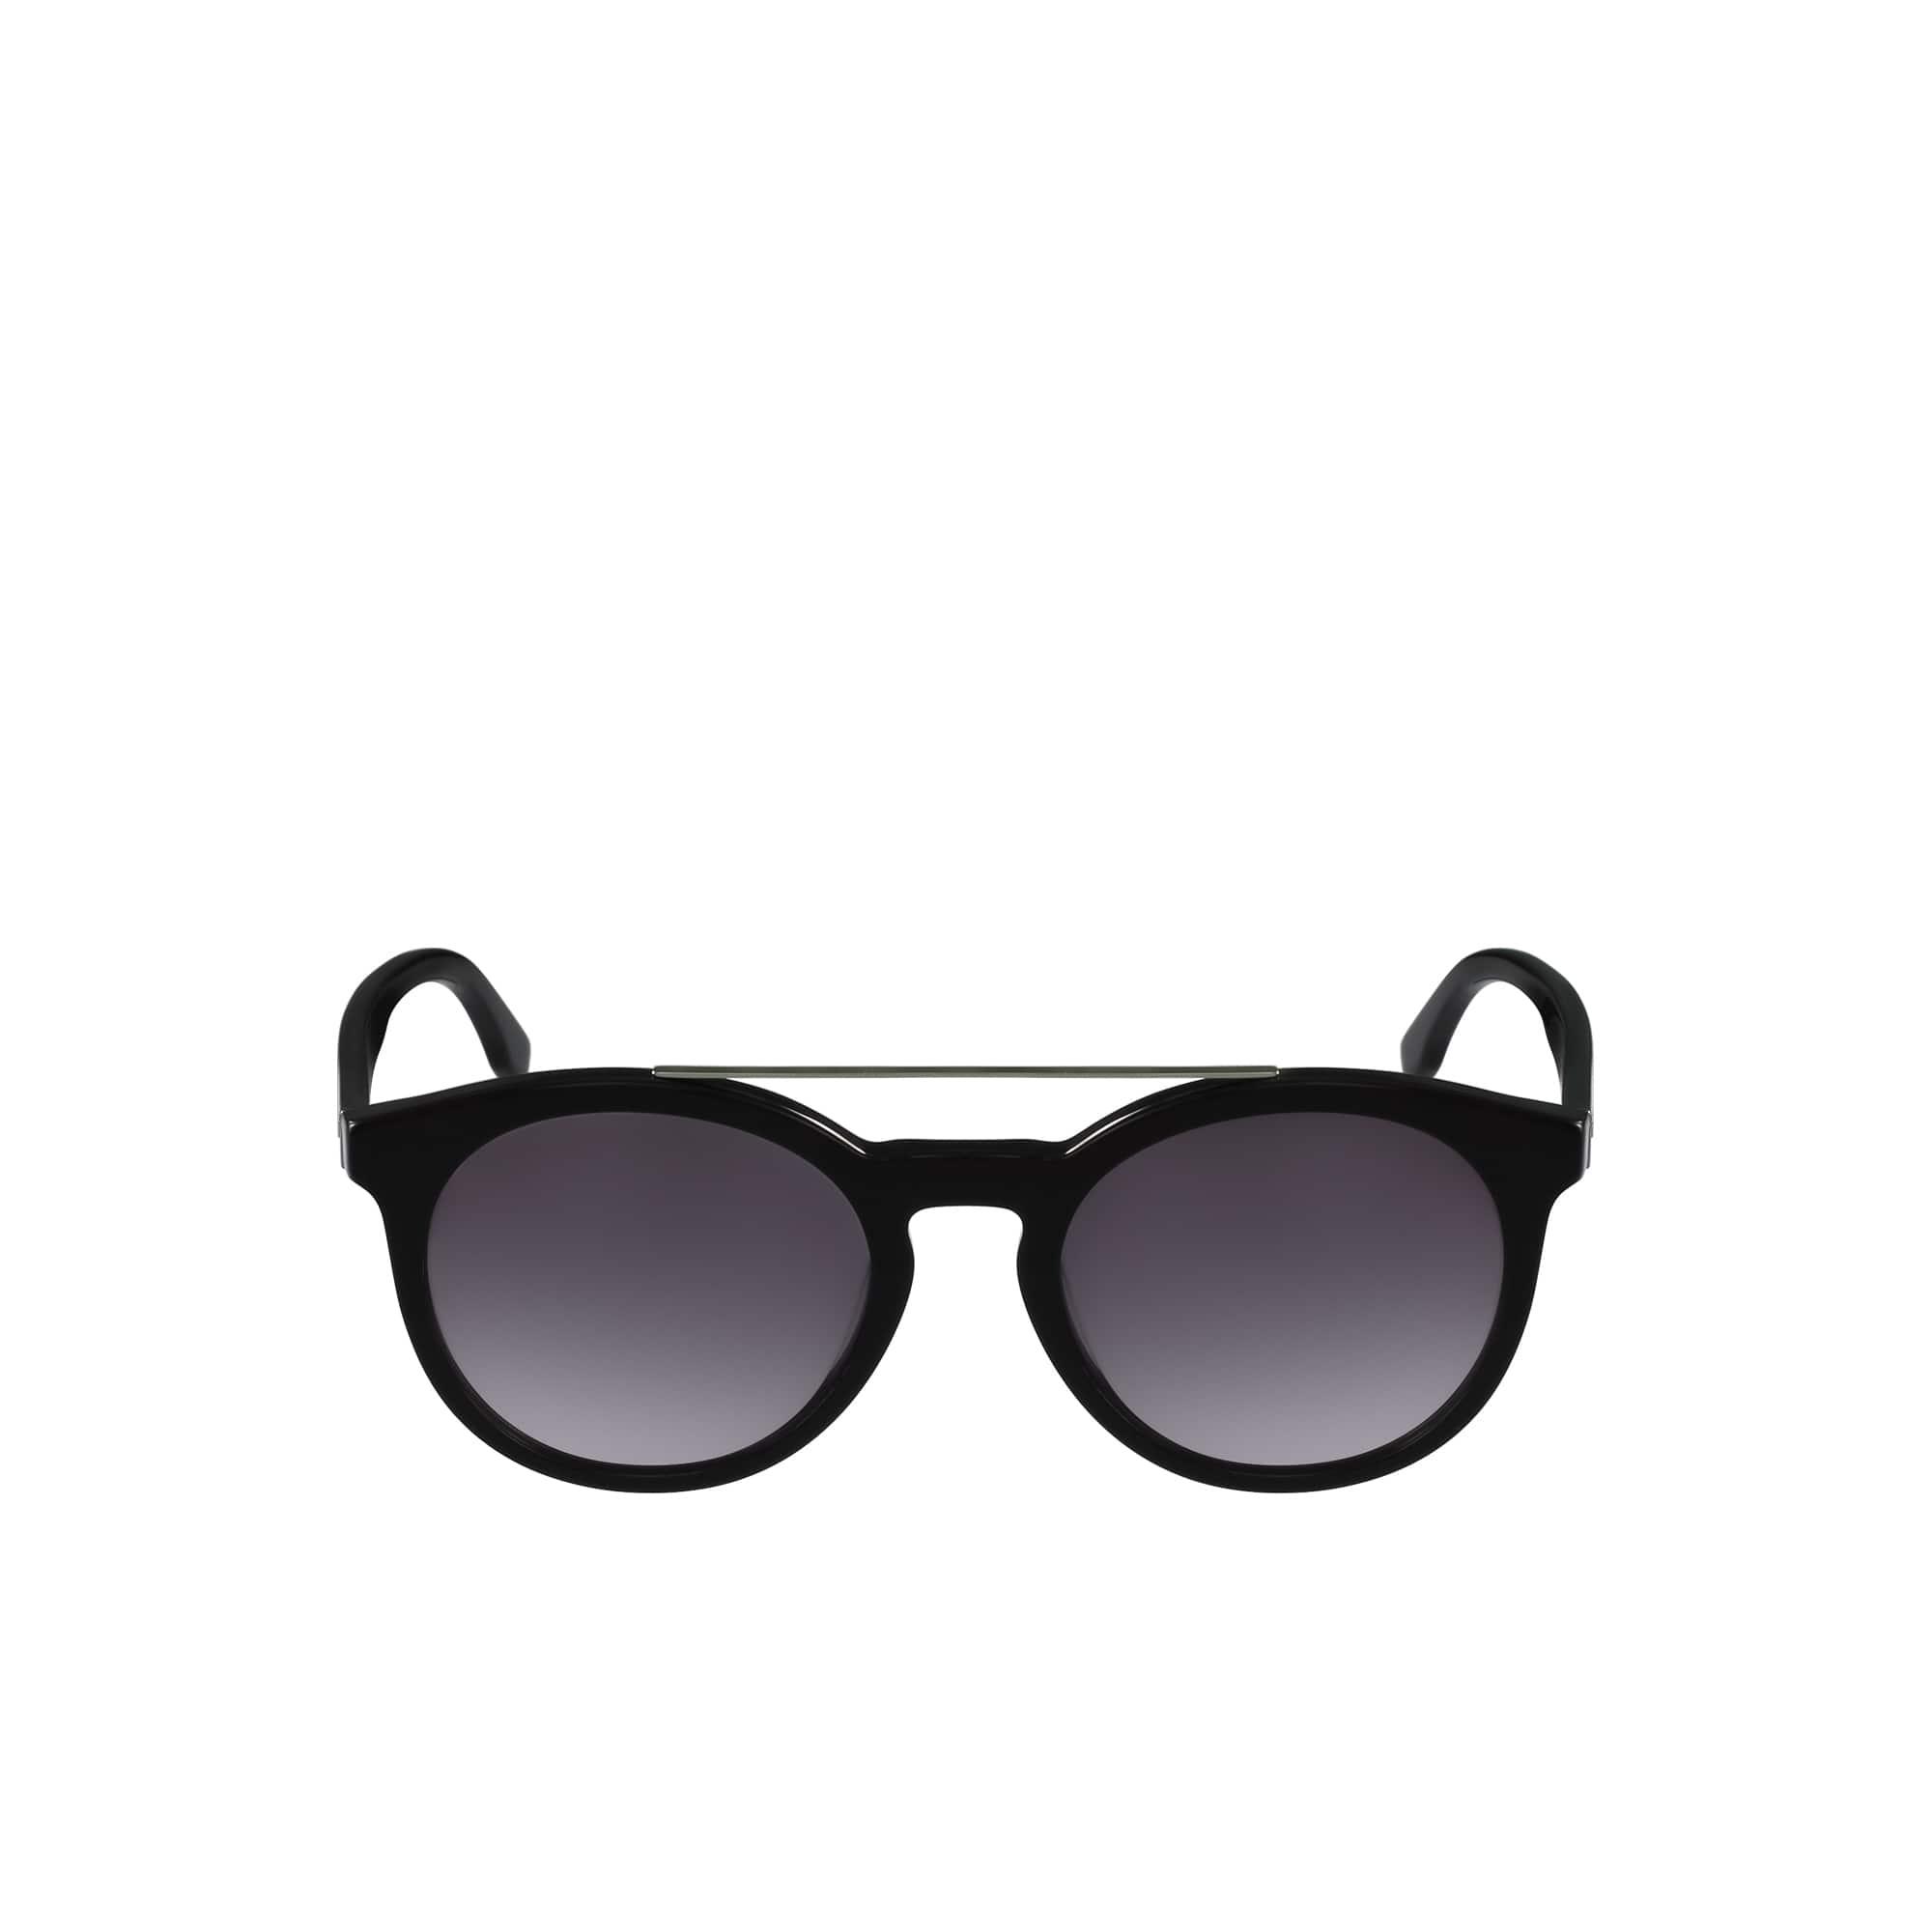 Men's Color Block Sunglasses